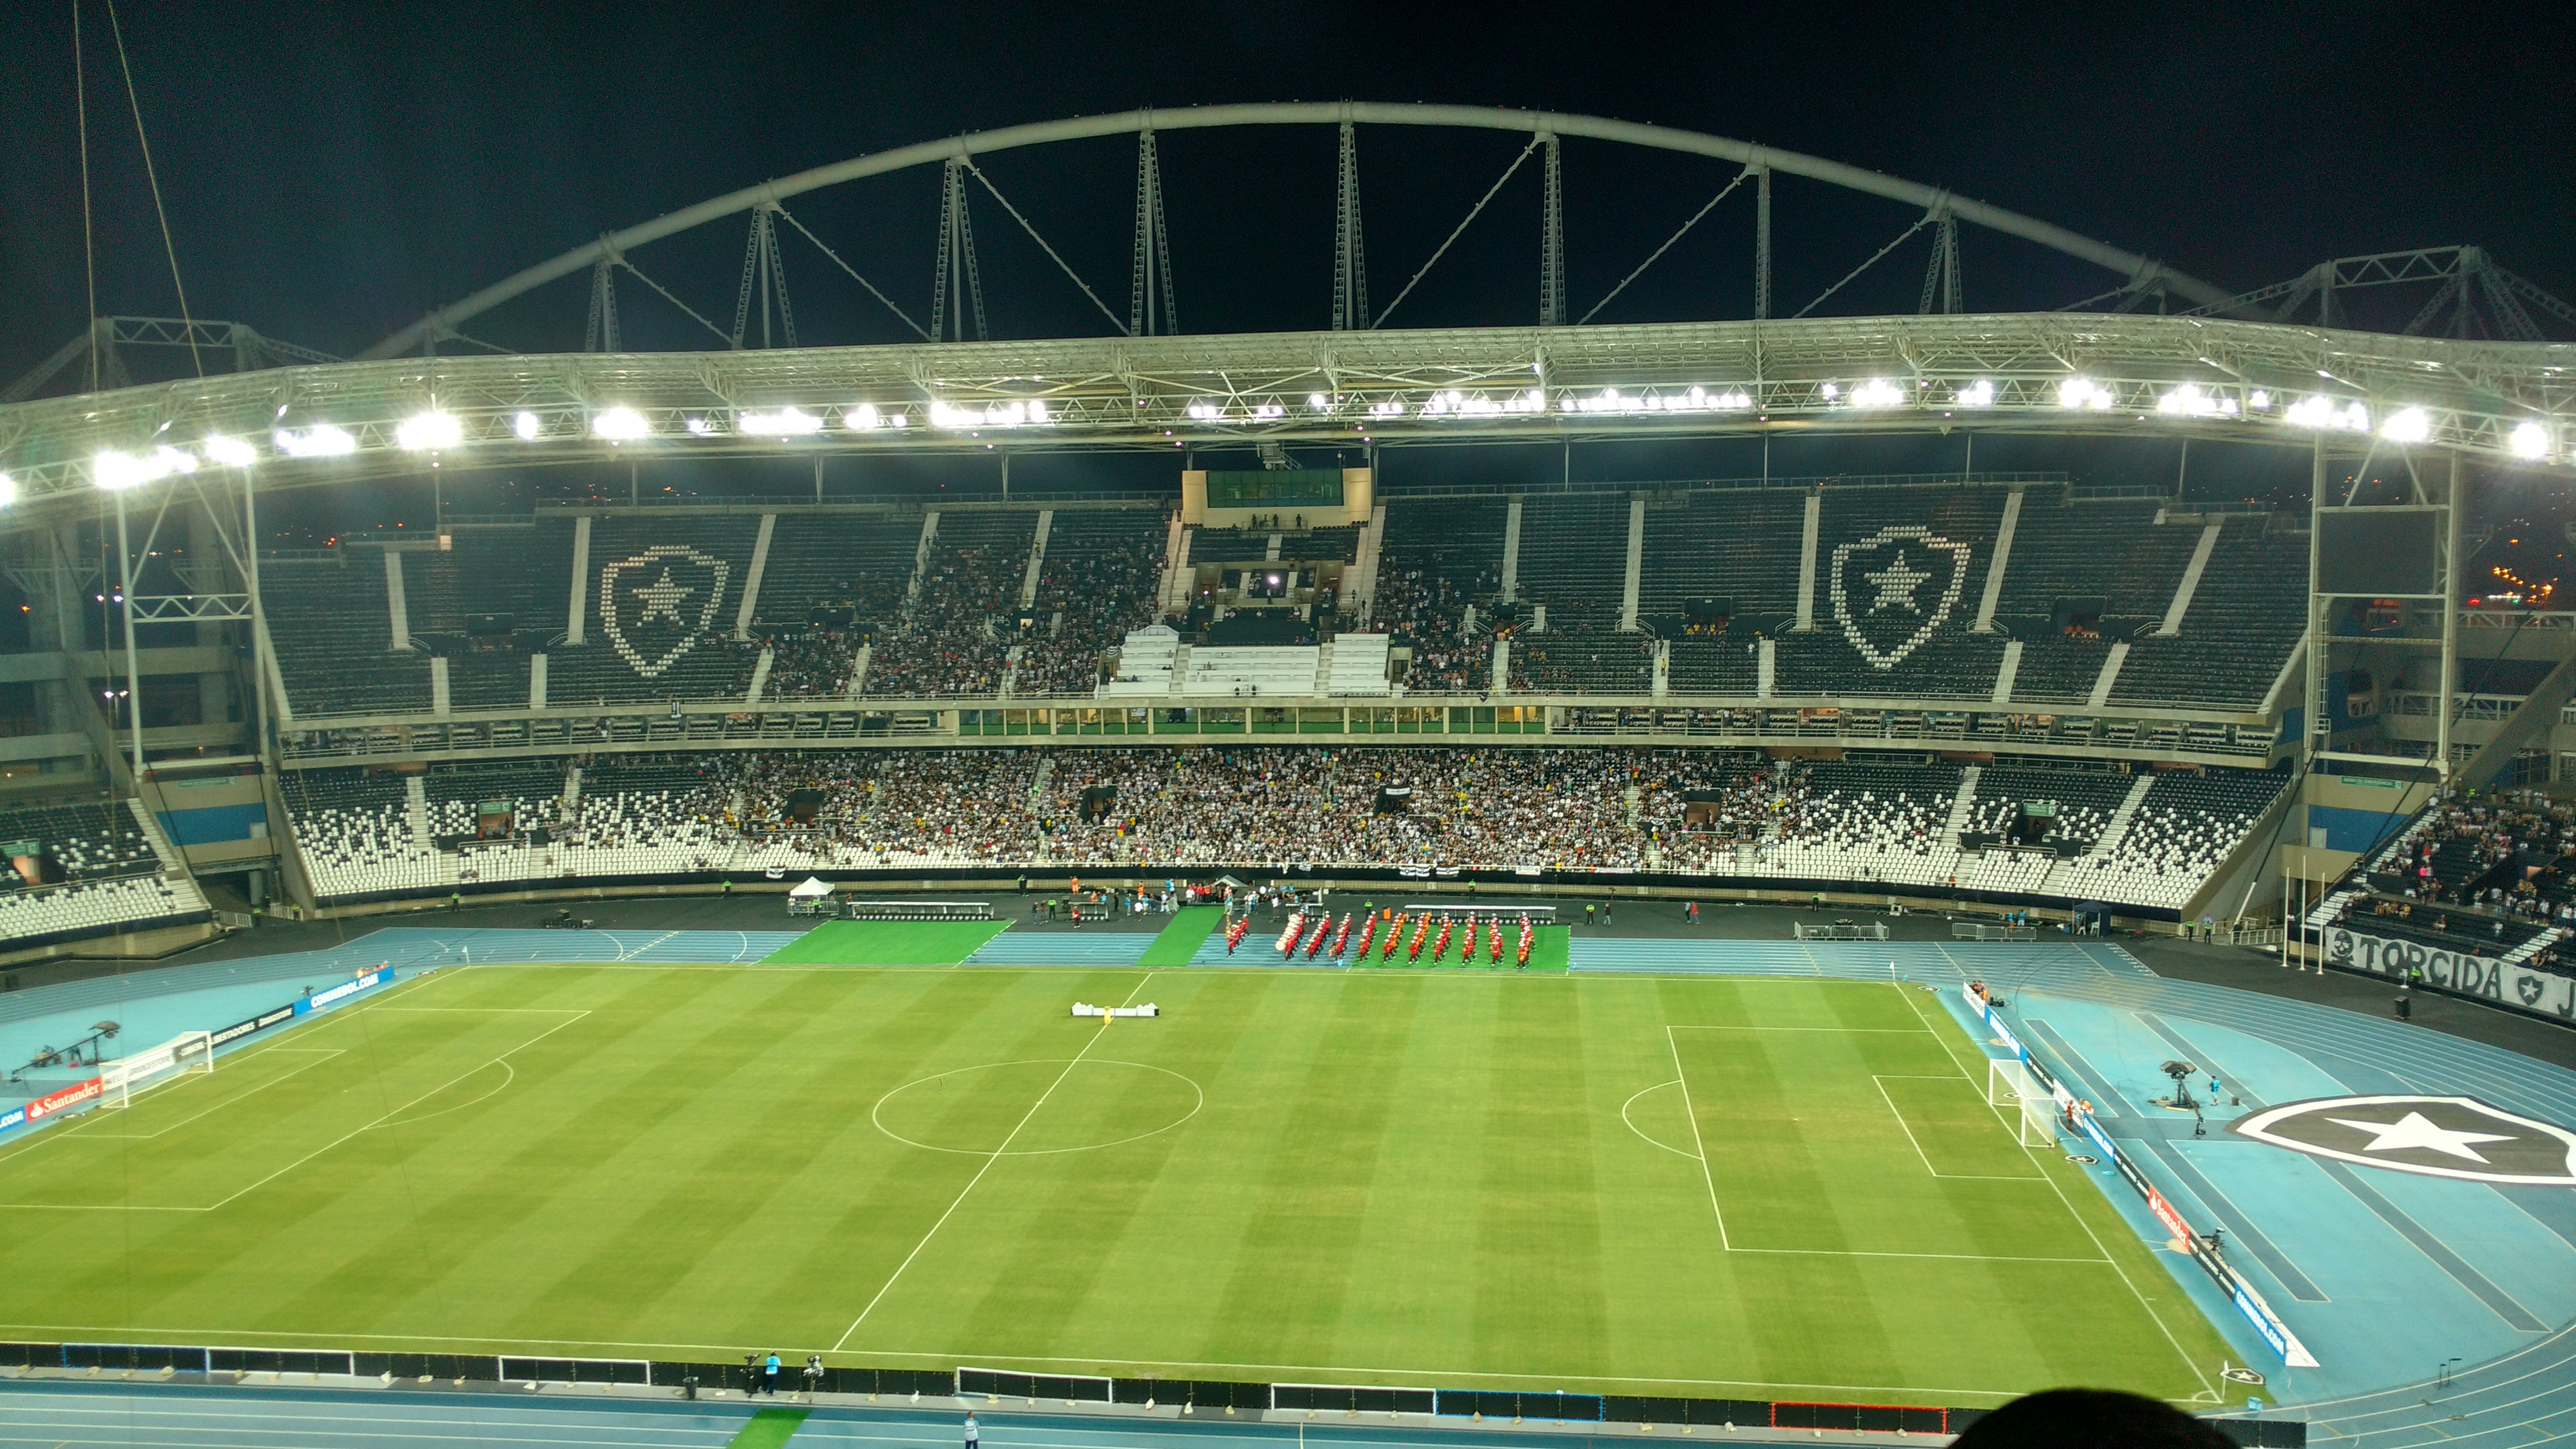 60c19dab68 Ficheiro Estádio Nilton Santos 2017.jpg – Wikipédia